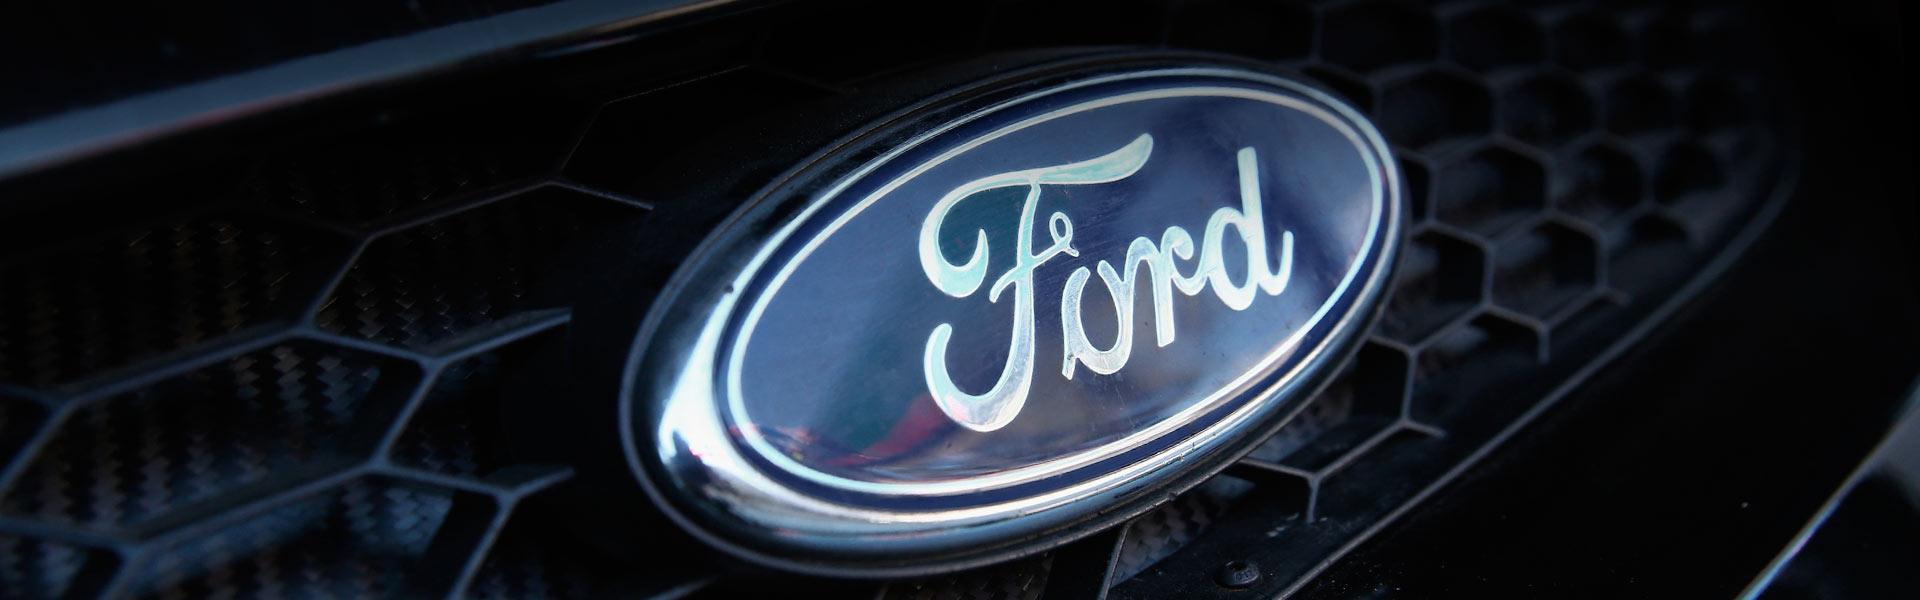 Замена вариатора Форд Фокус